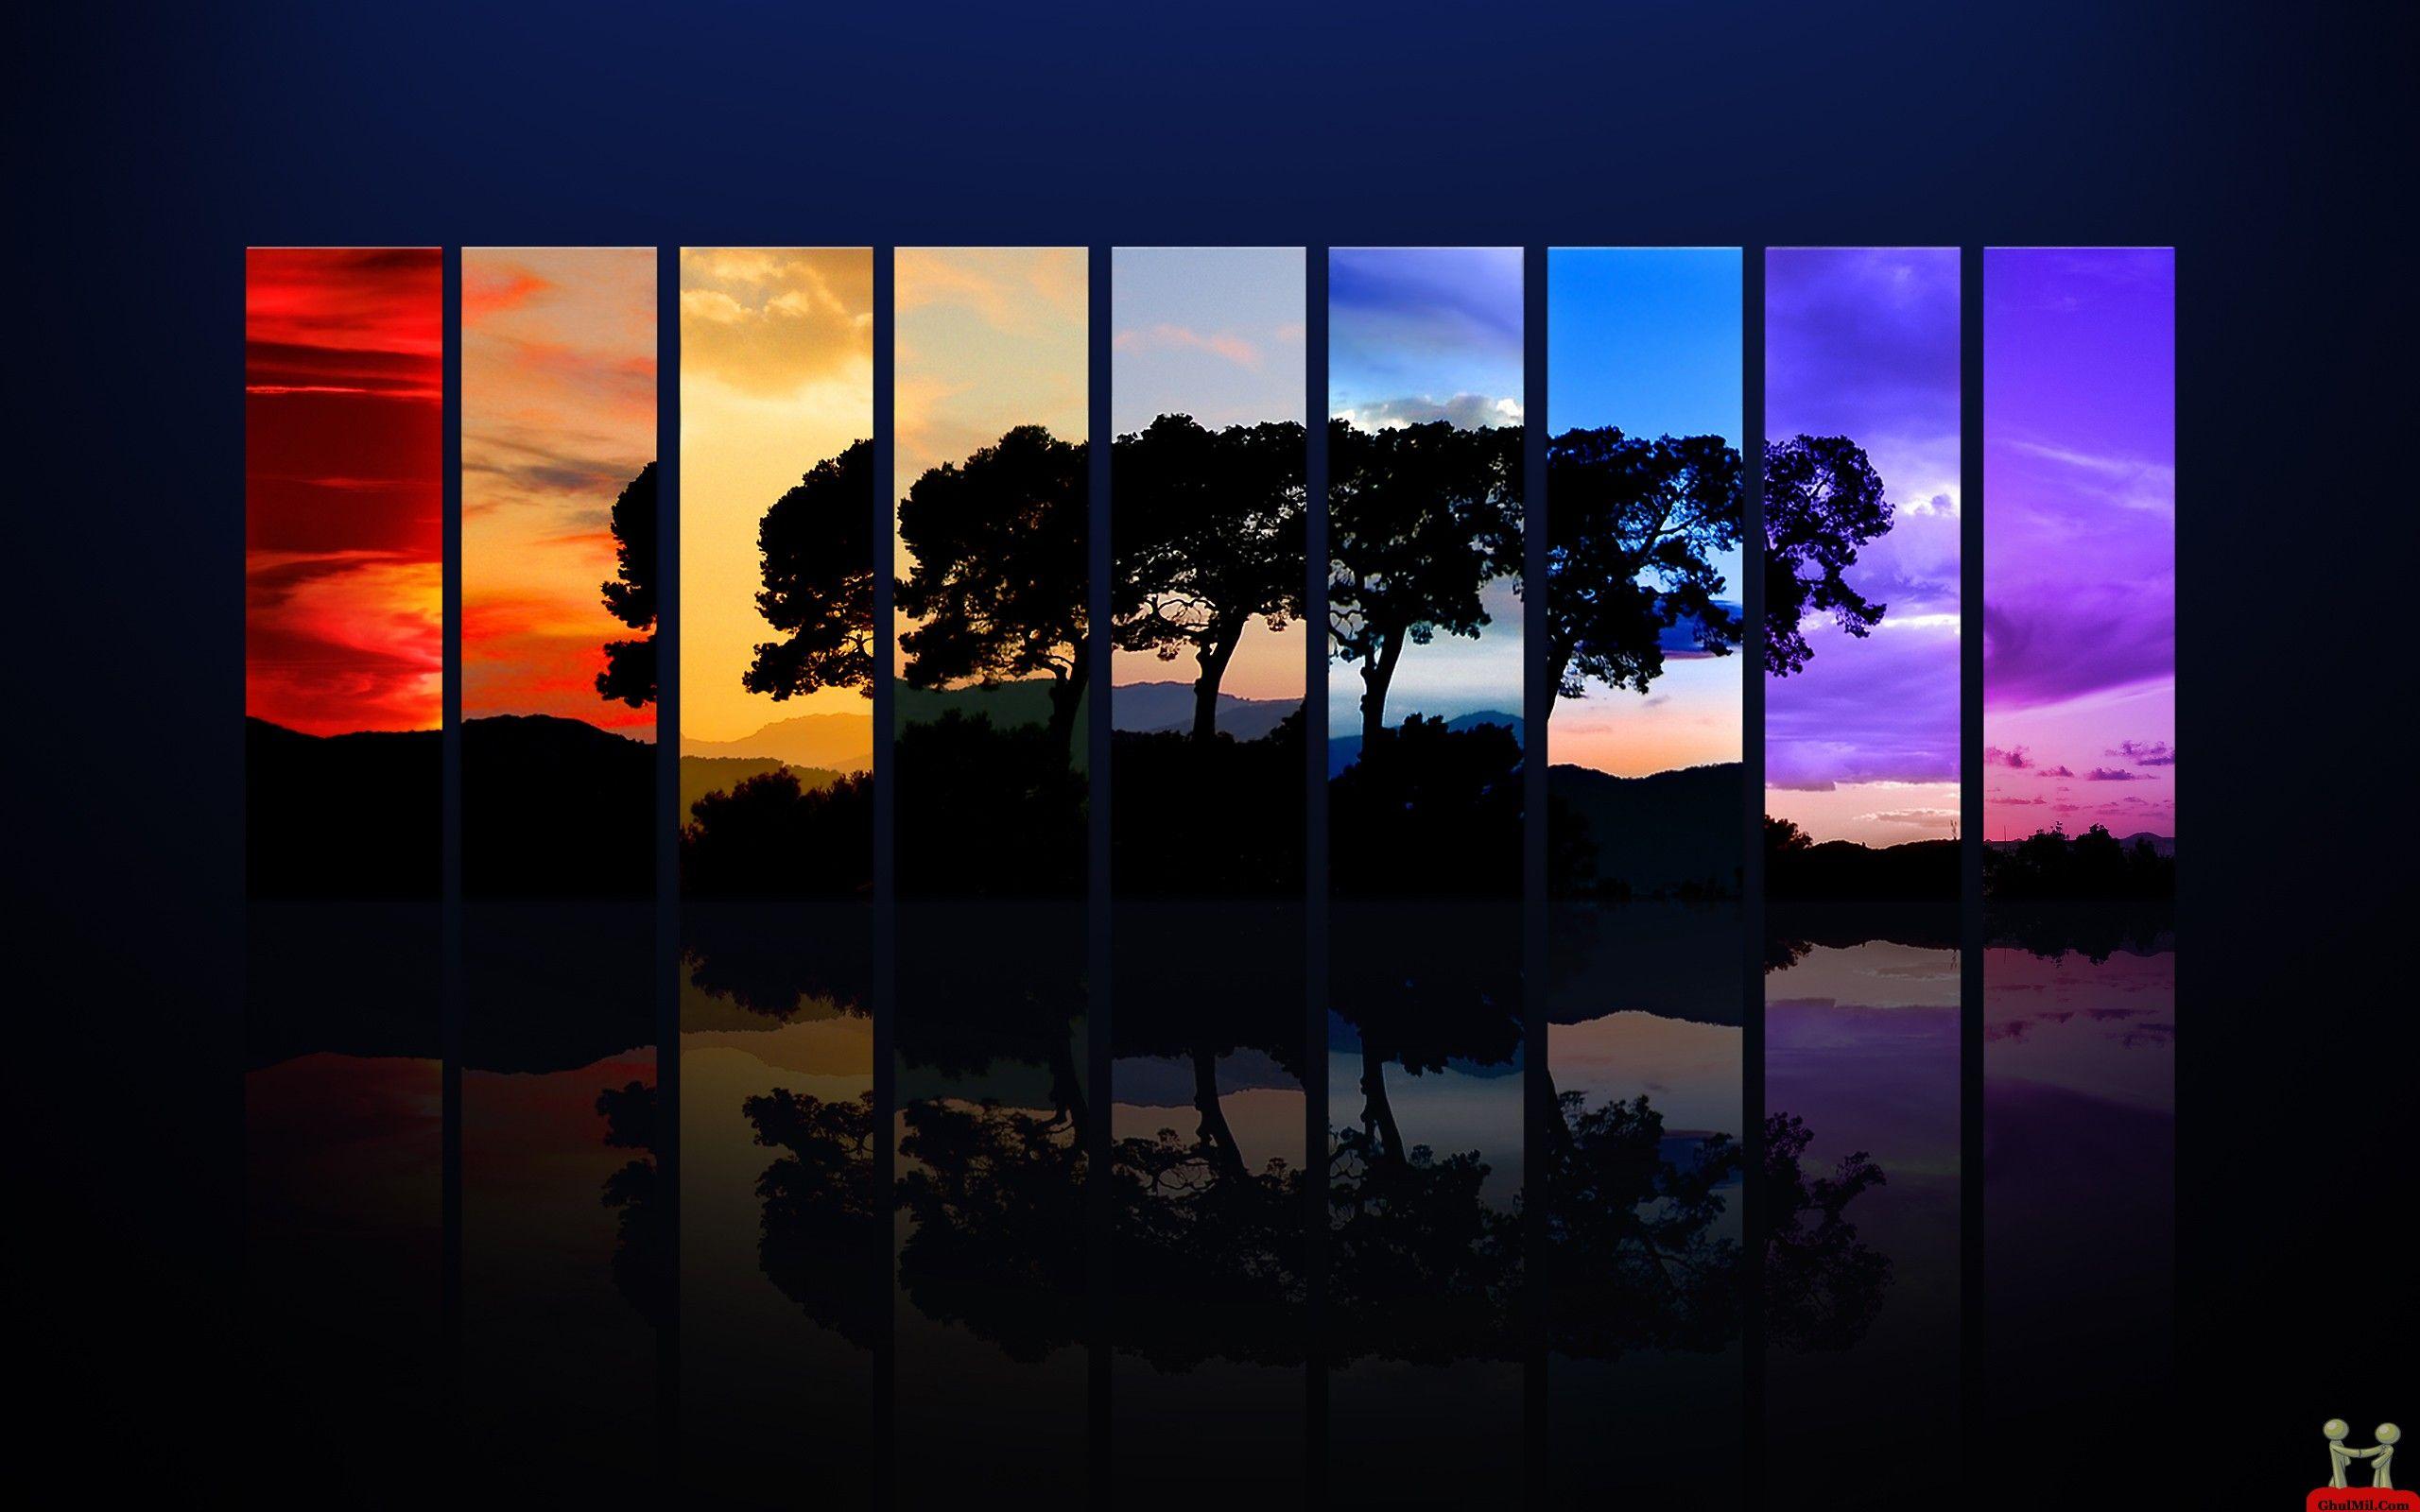 Amazing 3d wallpapers 3d amazing wallpaper fantasy for Amazing wallpapers for facebook